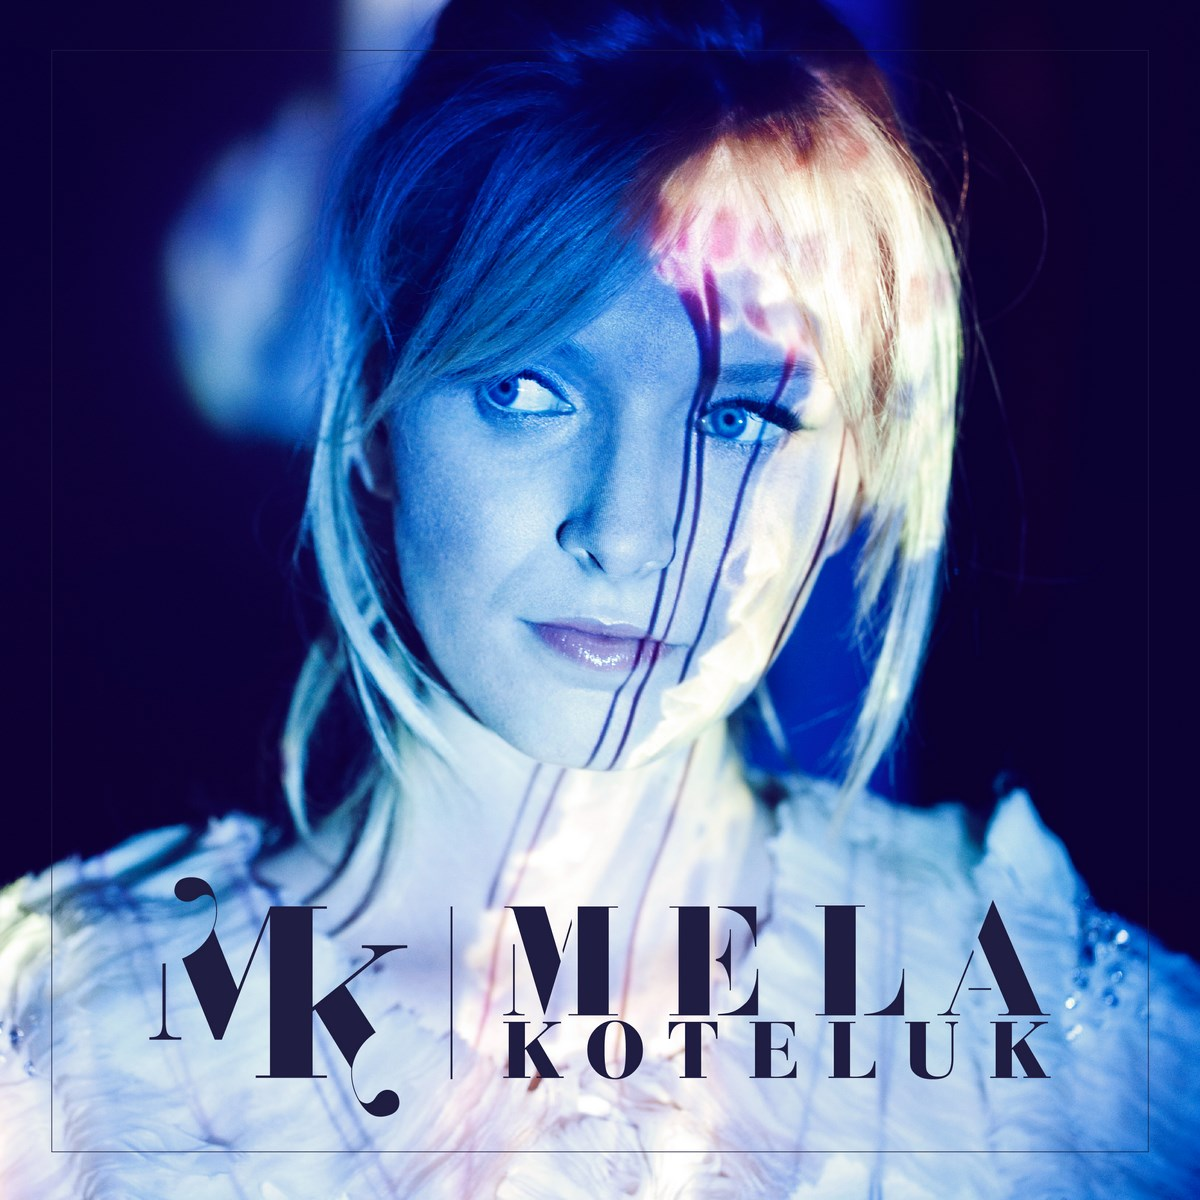 Mela Koteluk (autor: materiały prasowe organizatora)